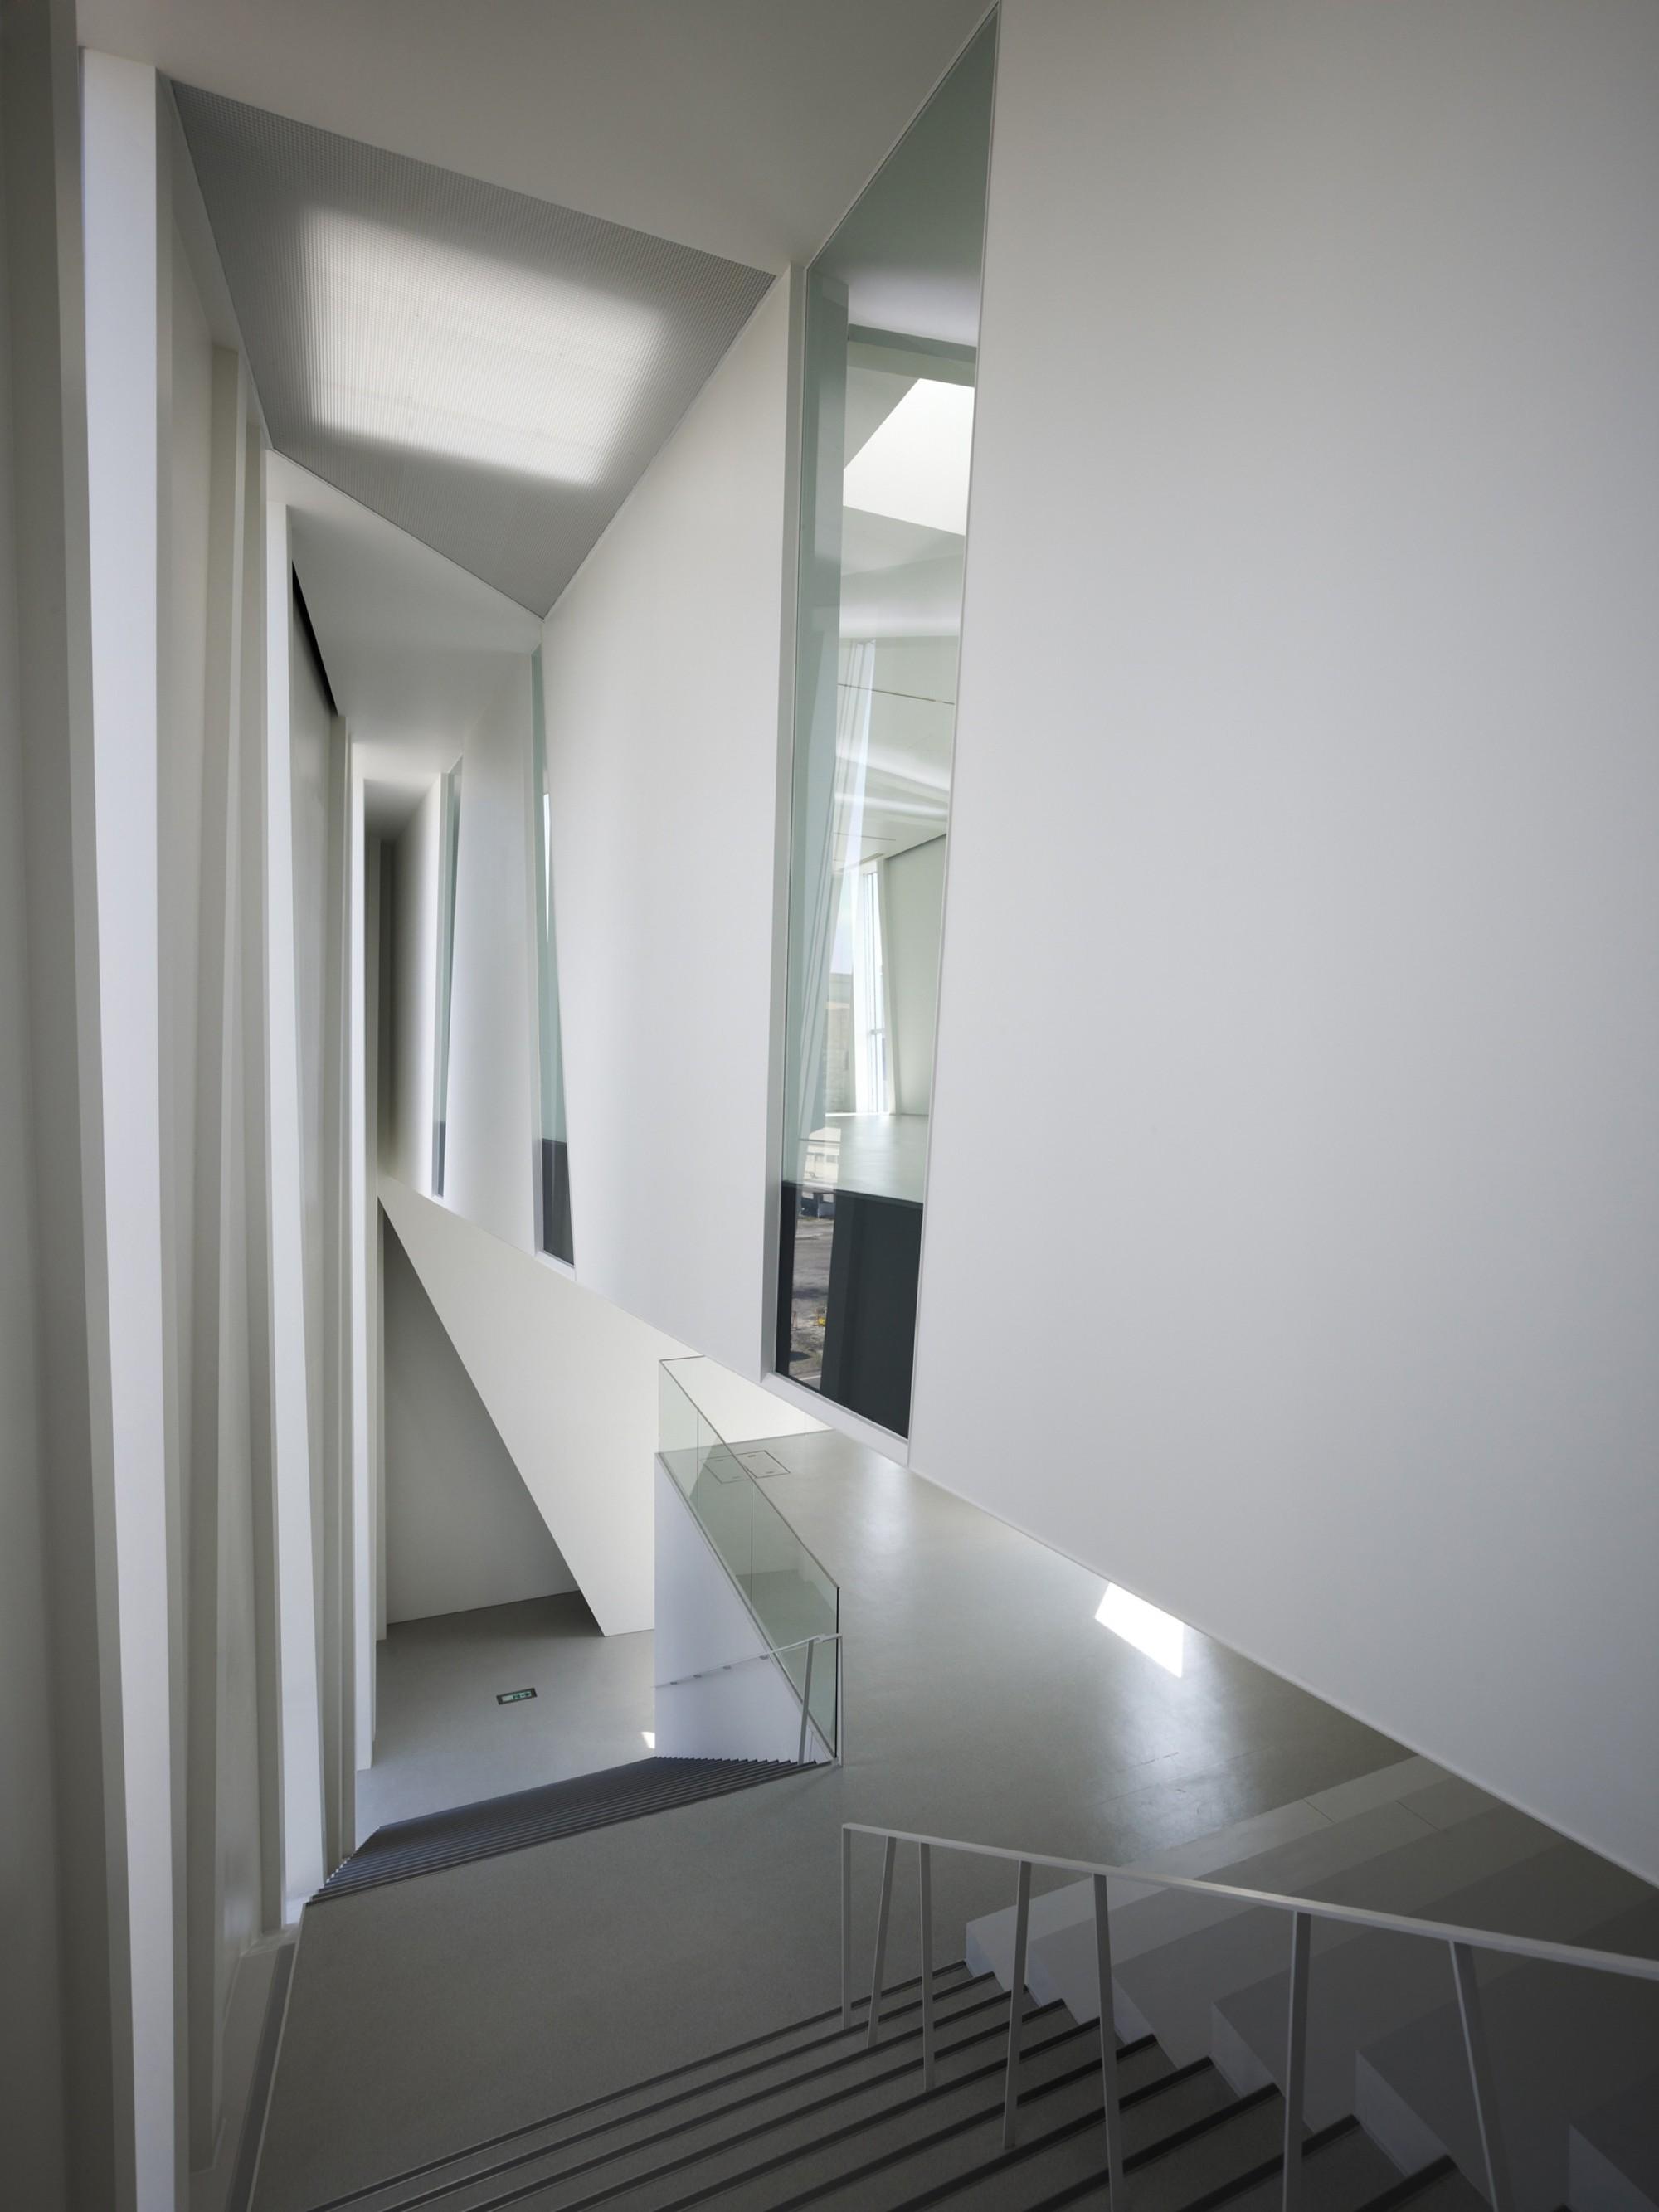 Spiralab / KINO Architects